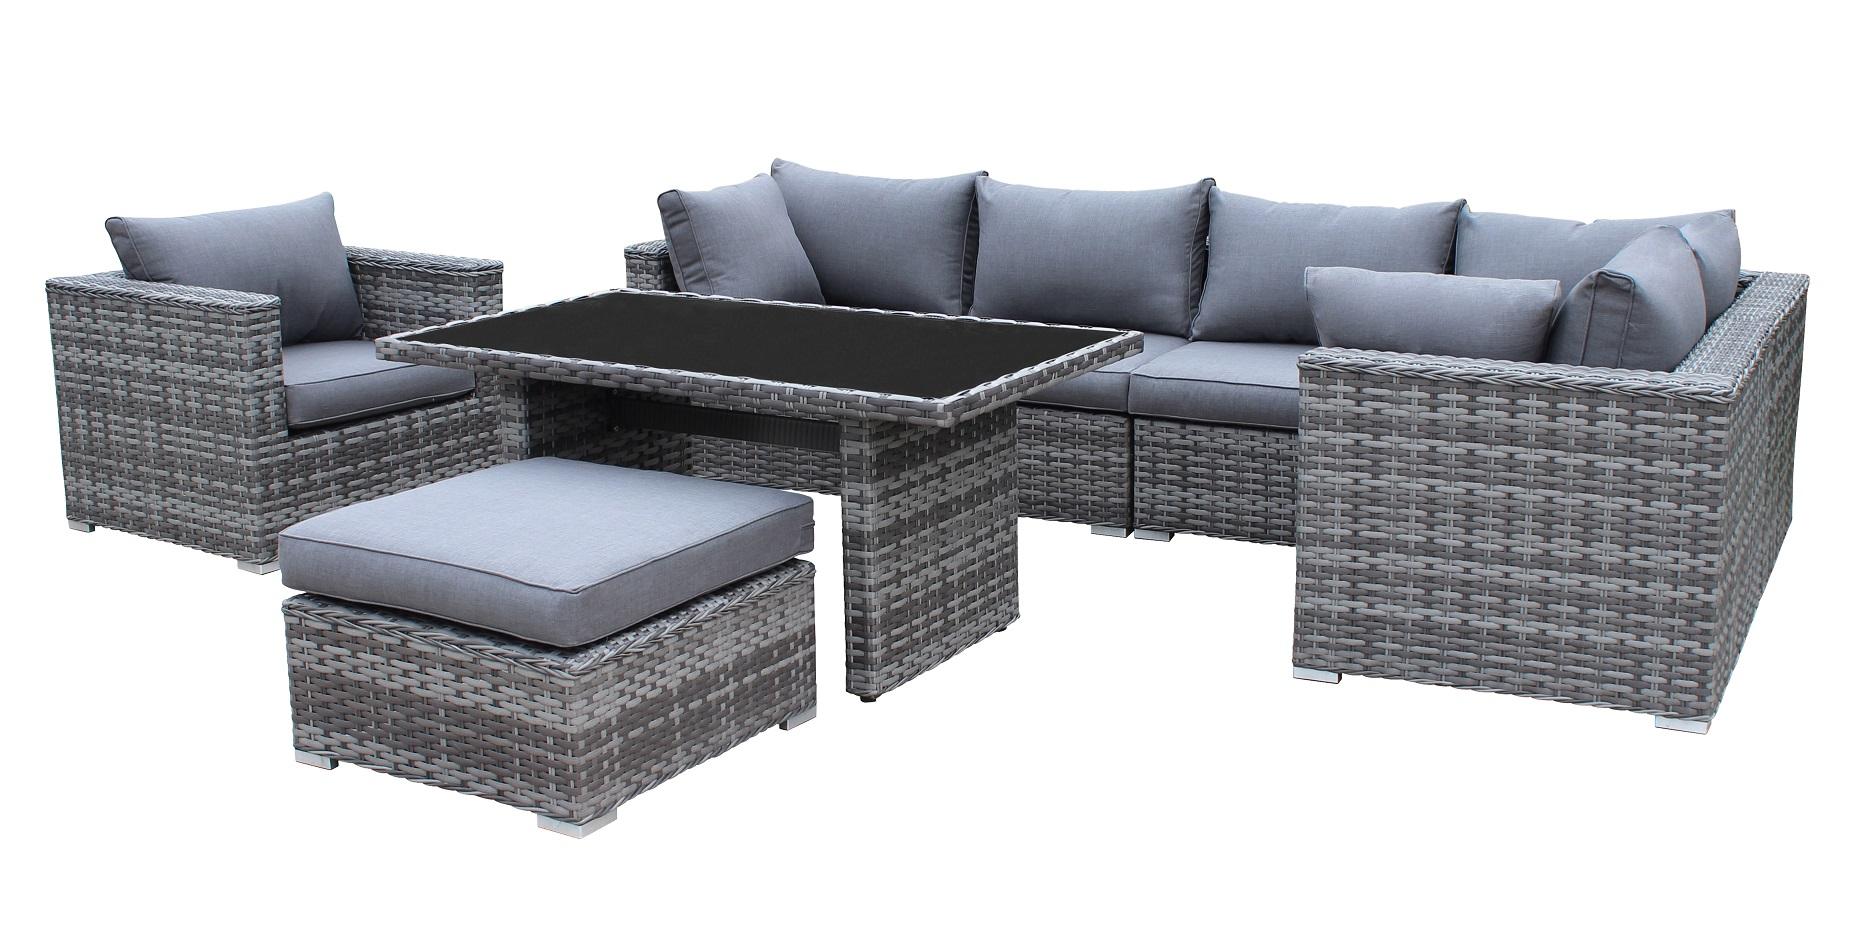 comfort xl polyrattan ecklounge gartenm bel sitzgruppe. Black Bedroom Furniture Sets. Home Design Ideas